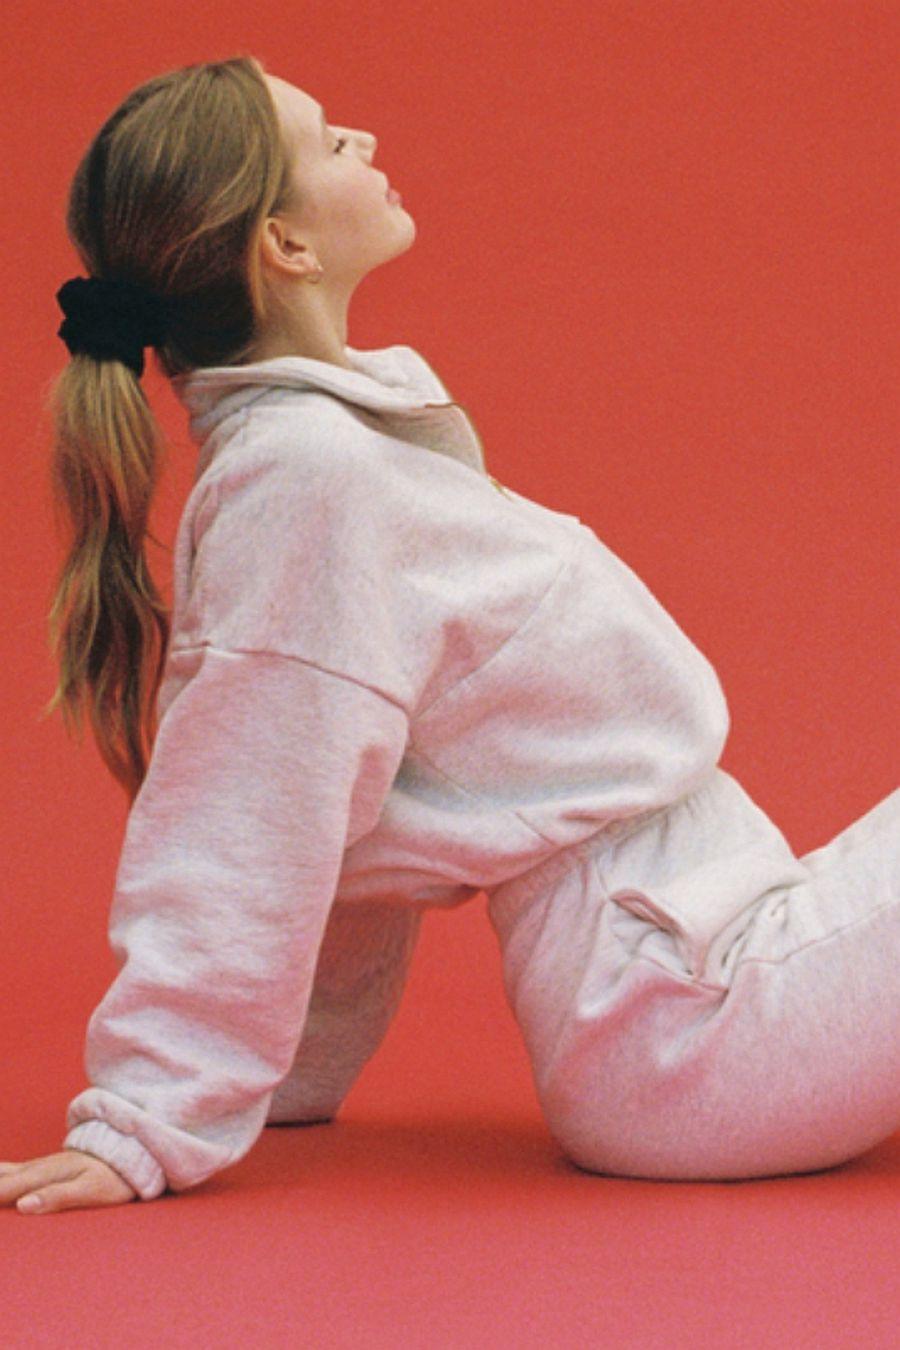 Gil Rodriguez Diana Half-Zip Sweatshirt - Ash Grey